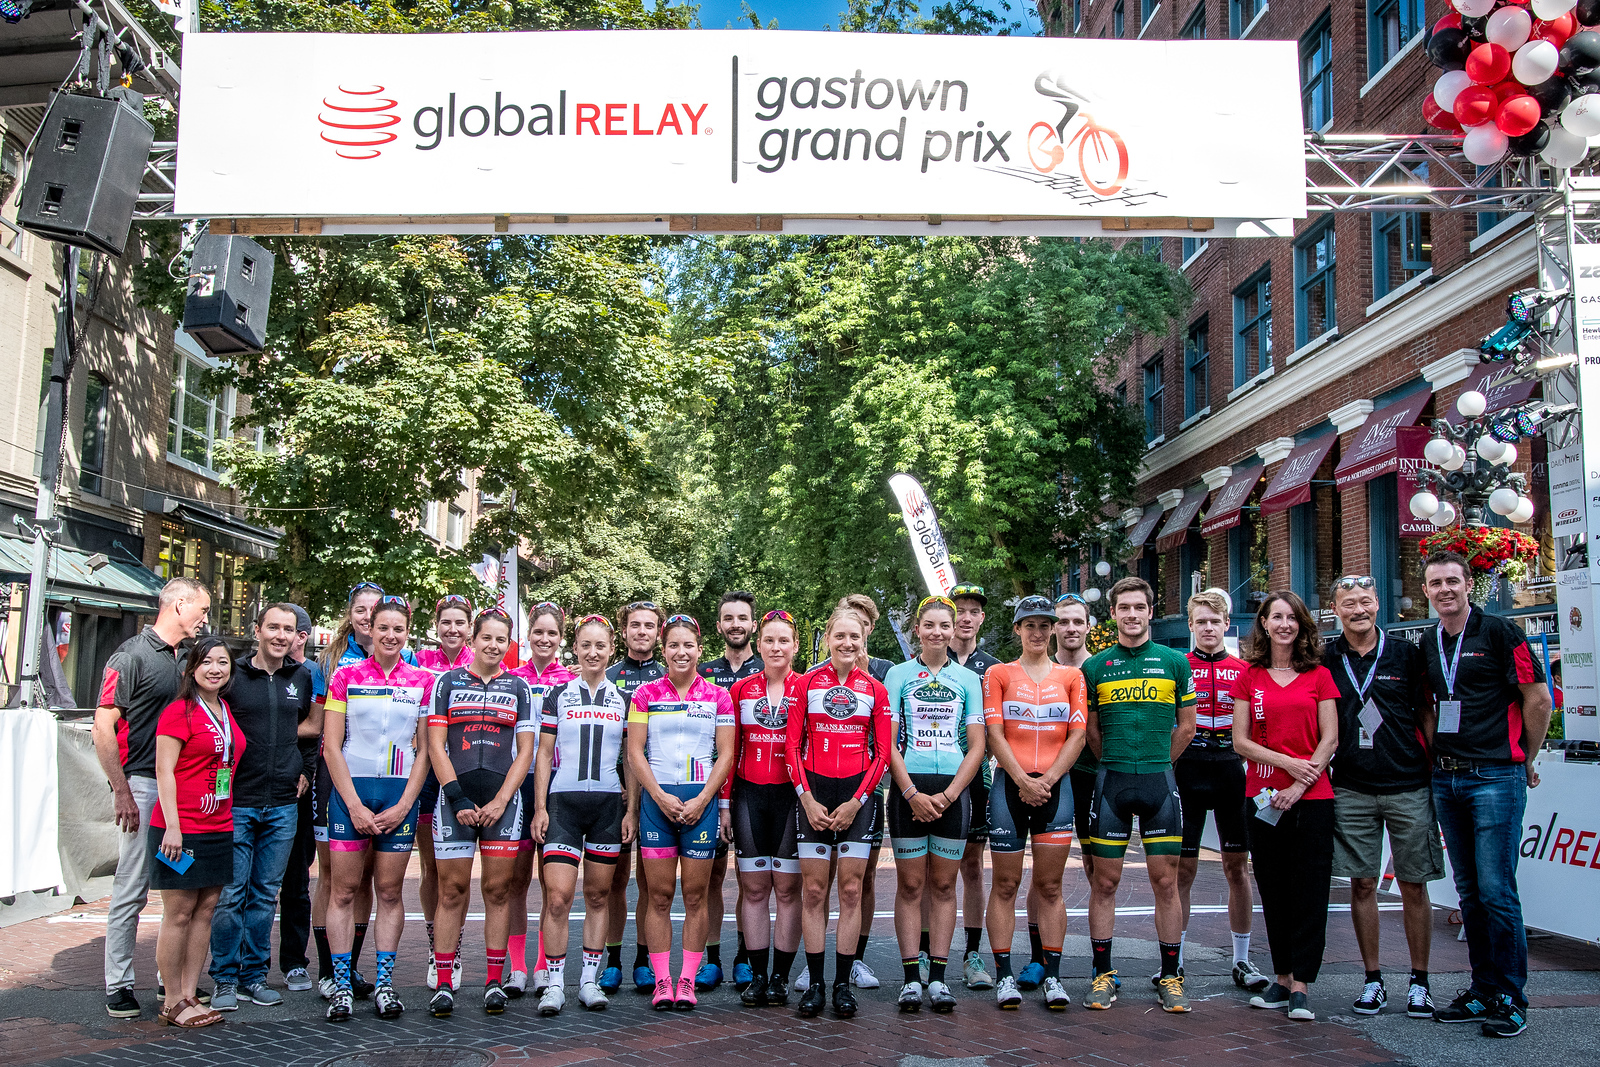 Global Relay Gastown Grand Prix 2017. Photo By: Scott Robarts